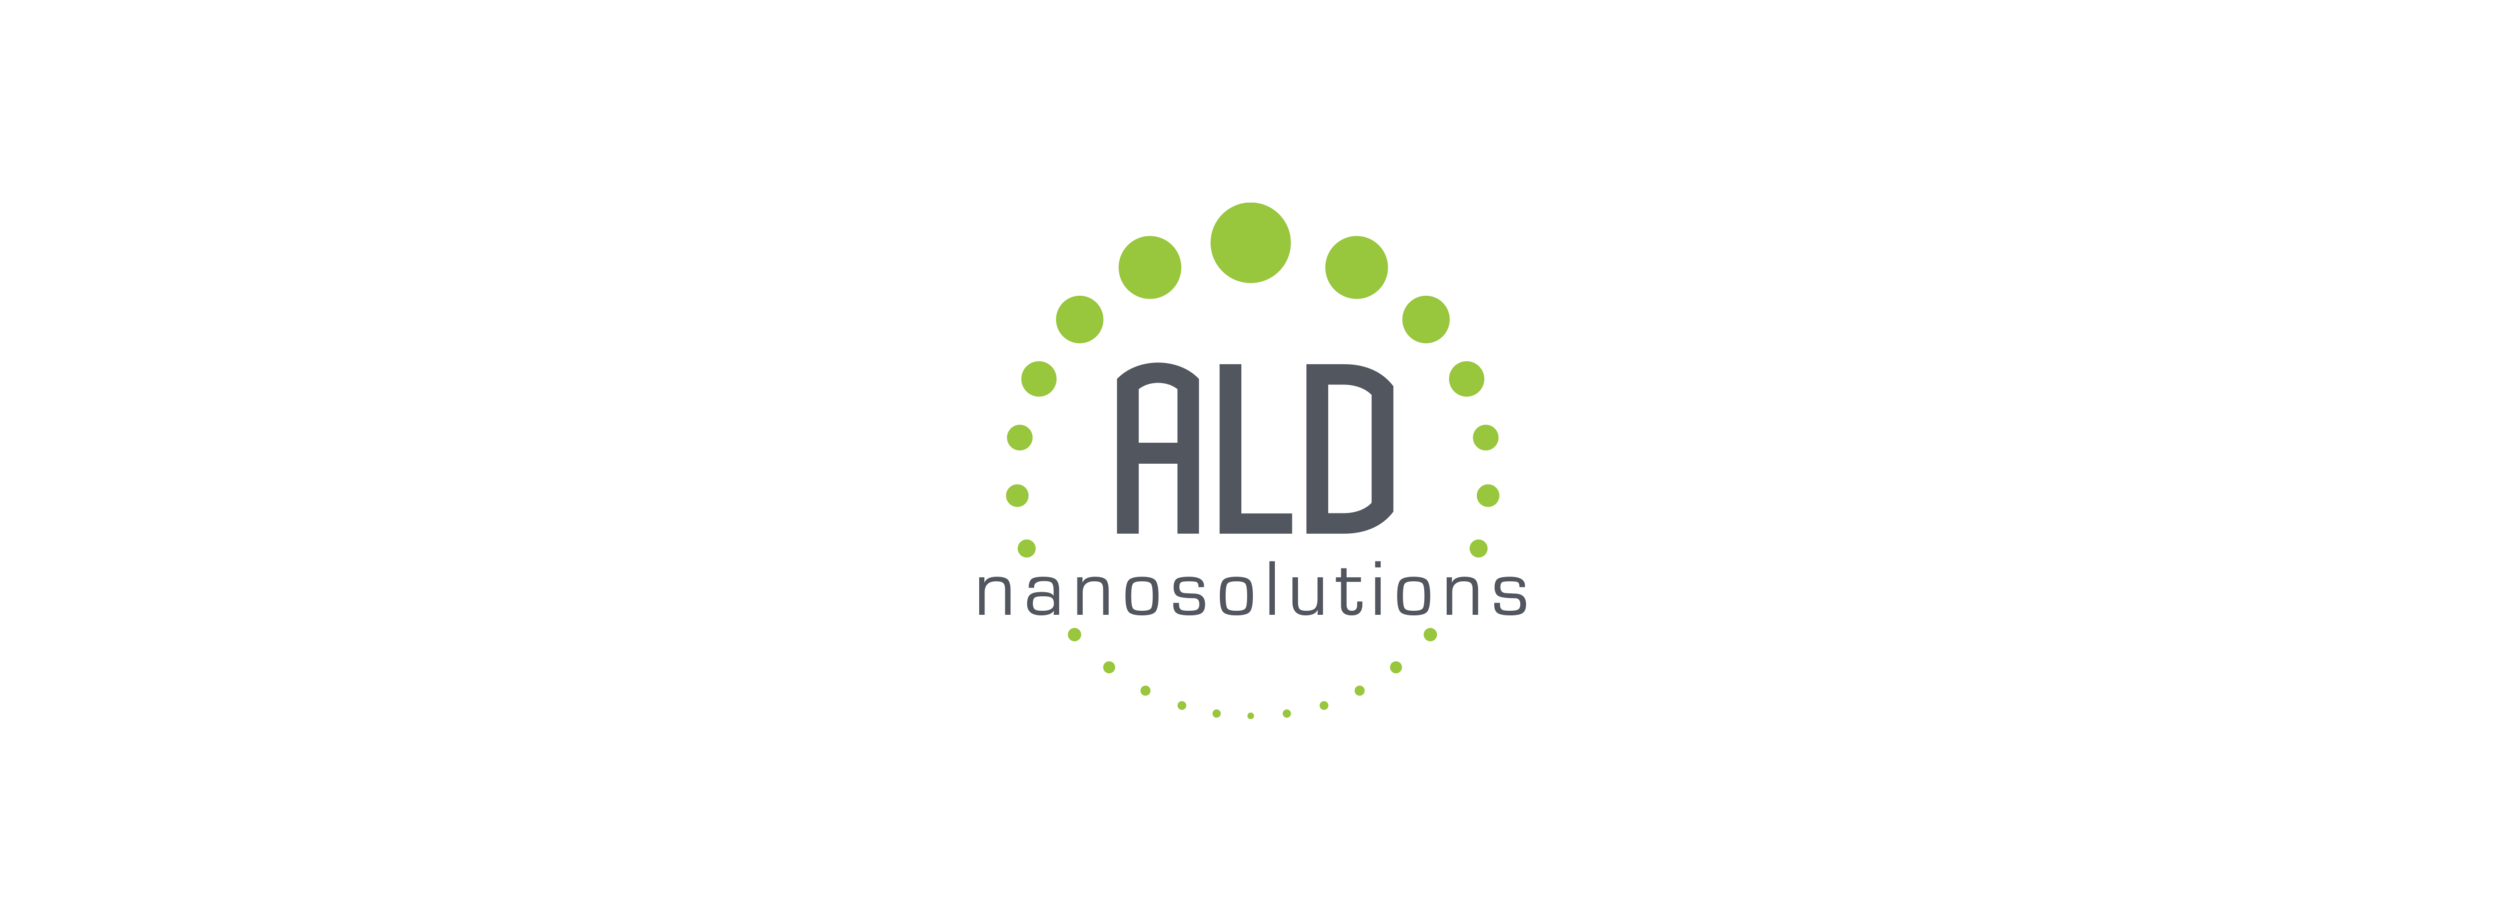 ALDN_logo_2c_flat,-v2.png